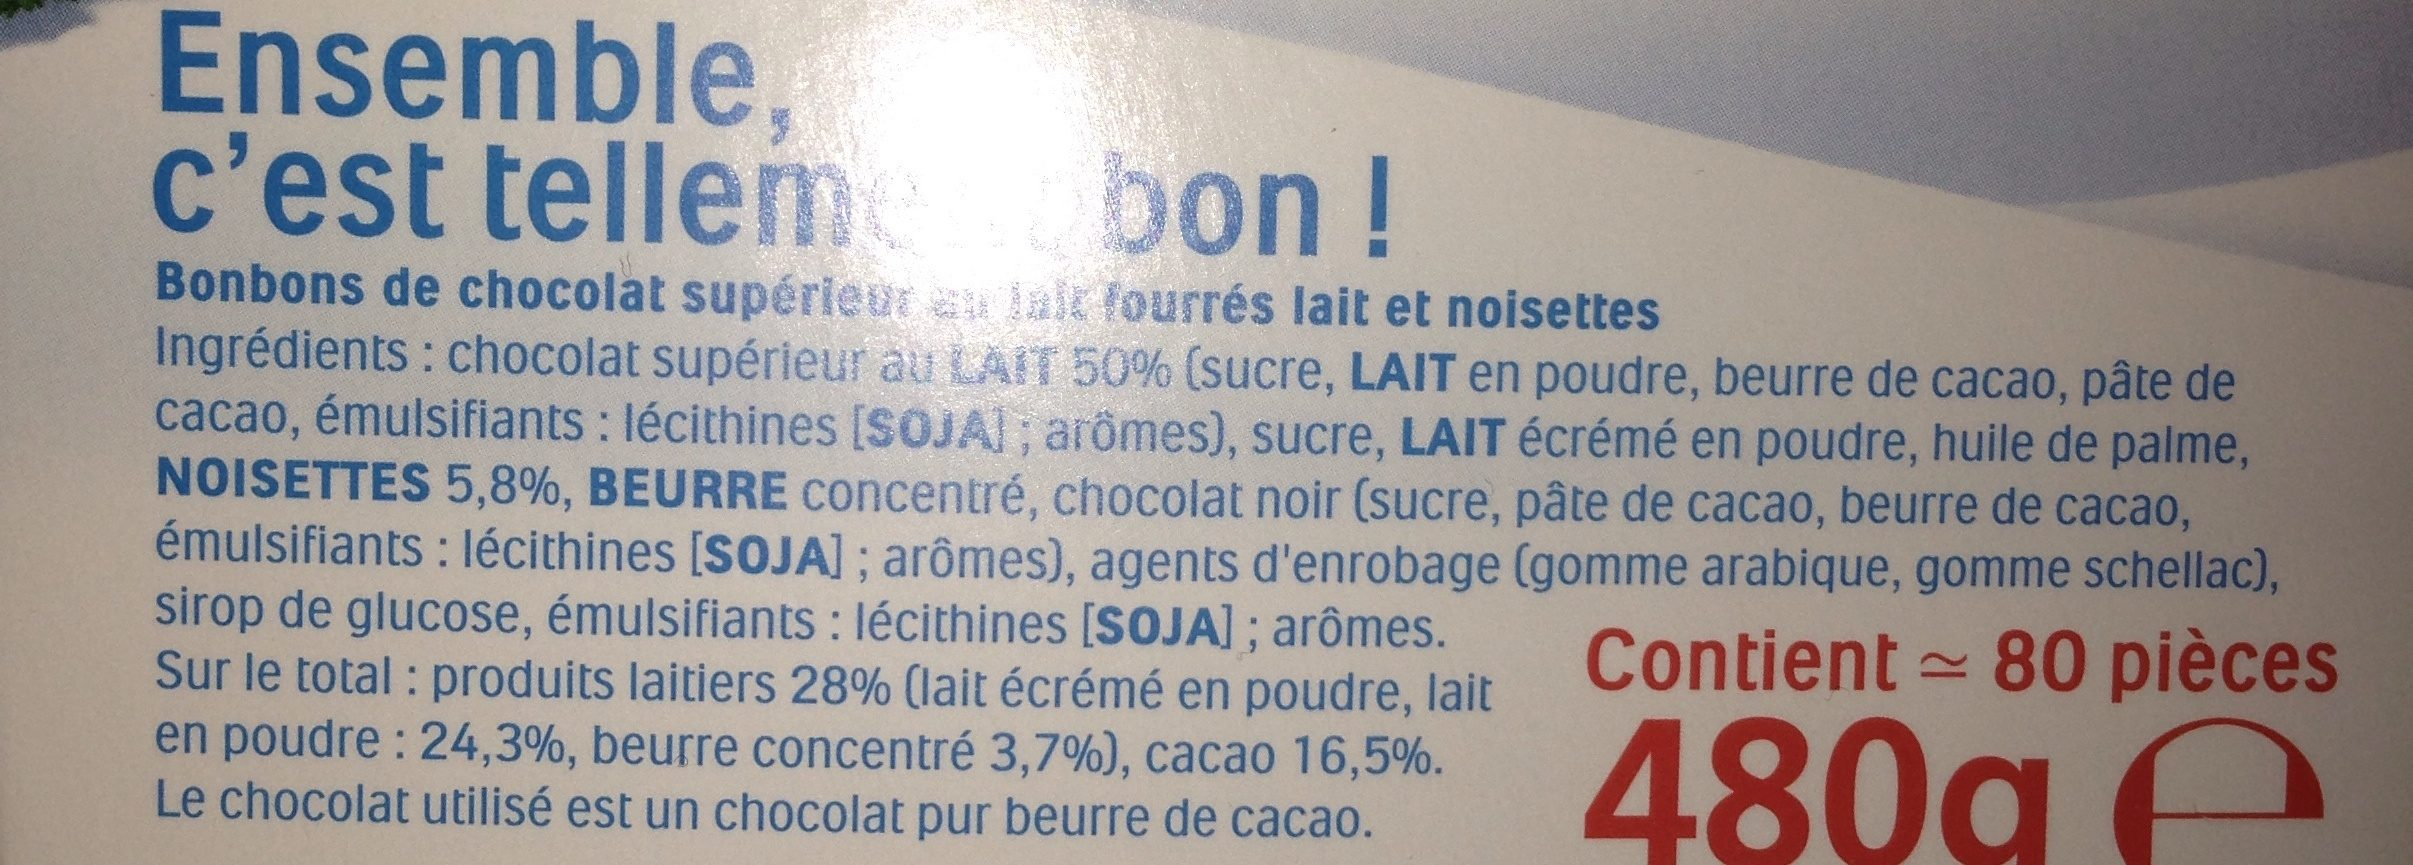 Kinder schokobons ballotin boite de - Ingredienti - fr